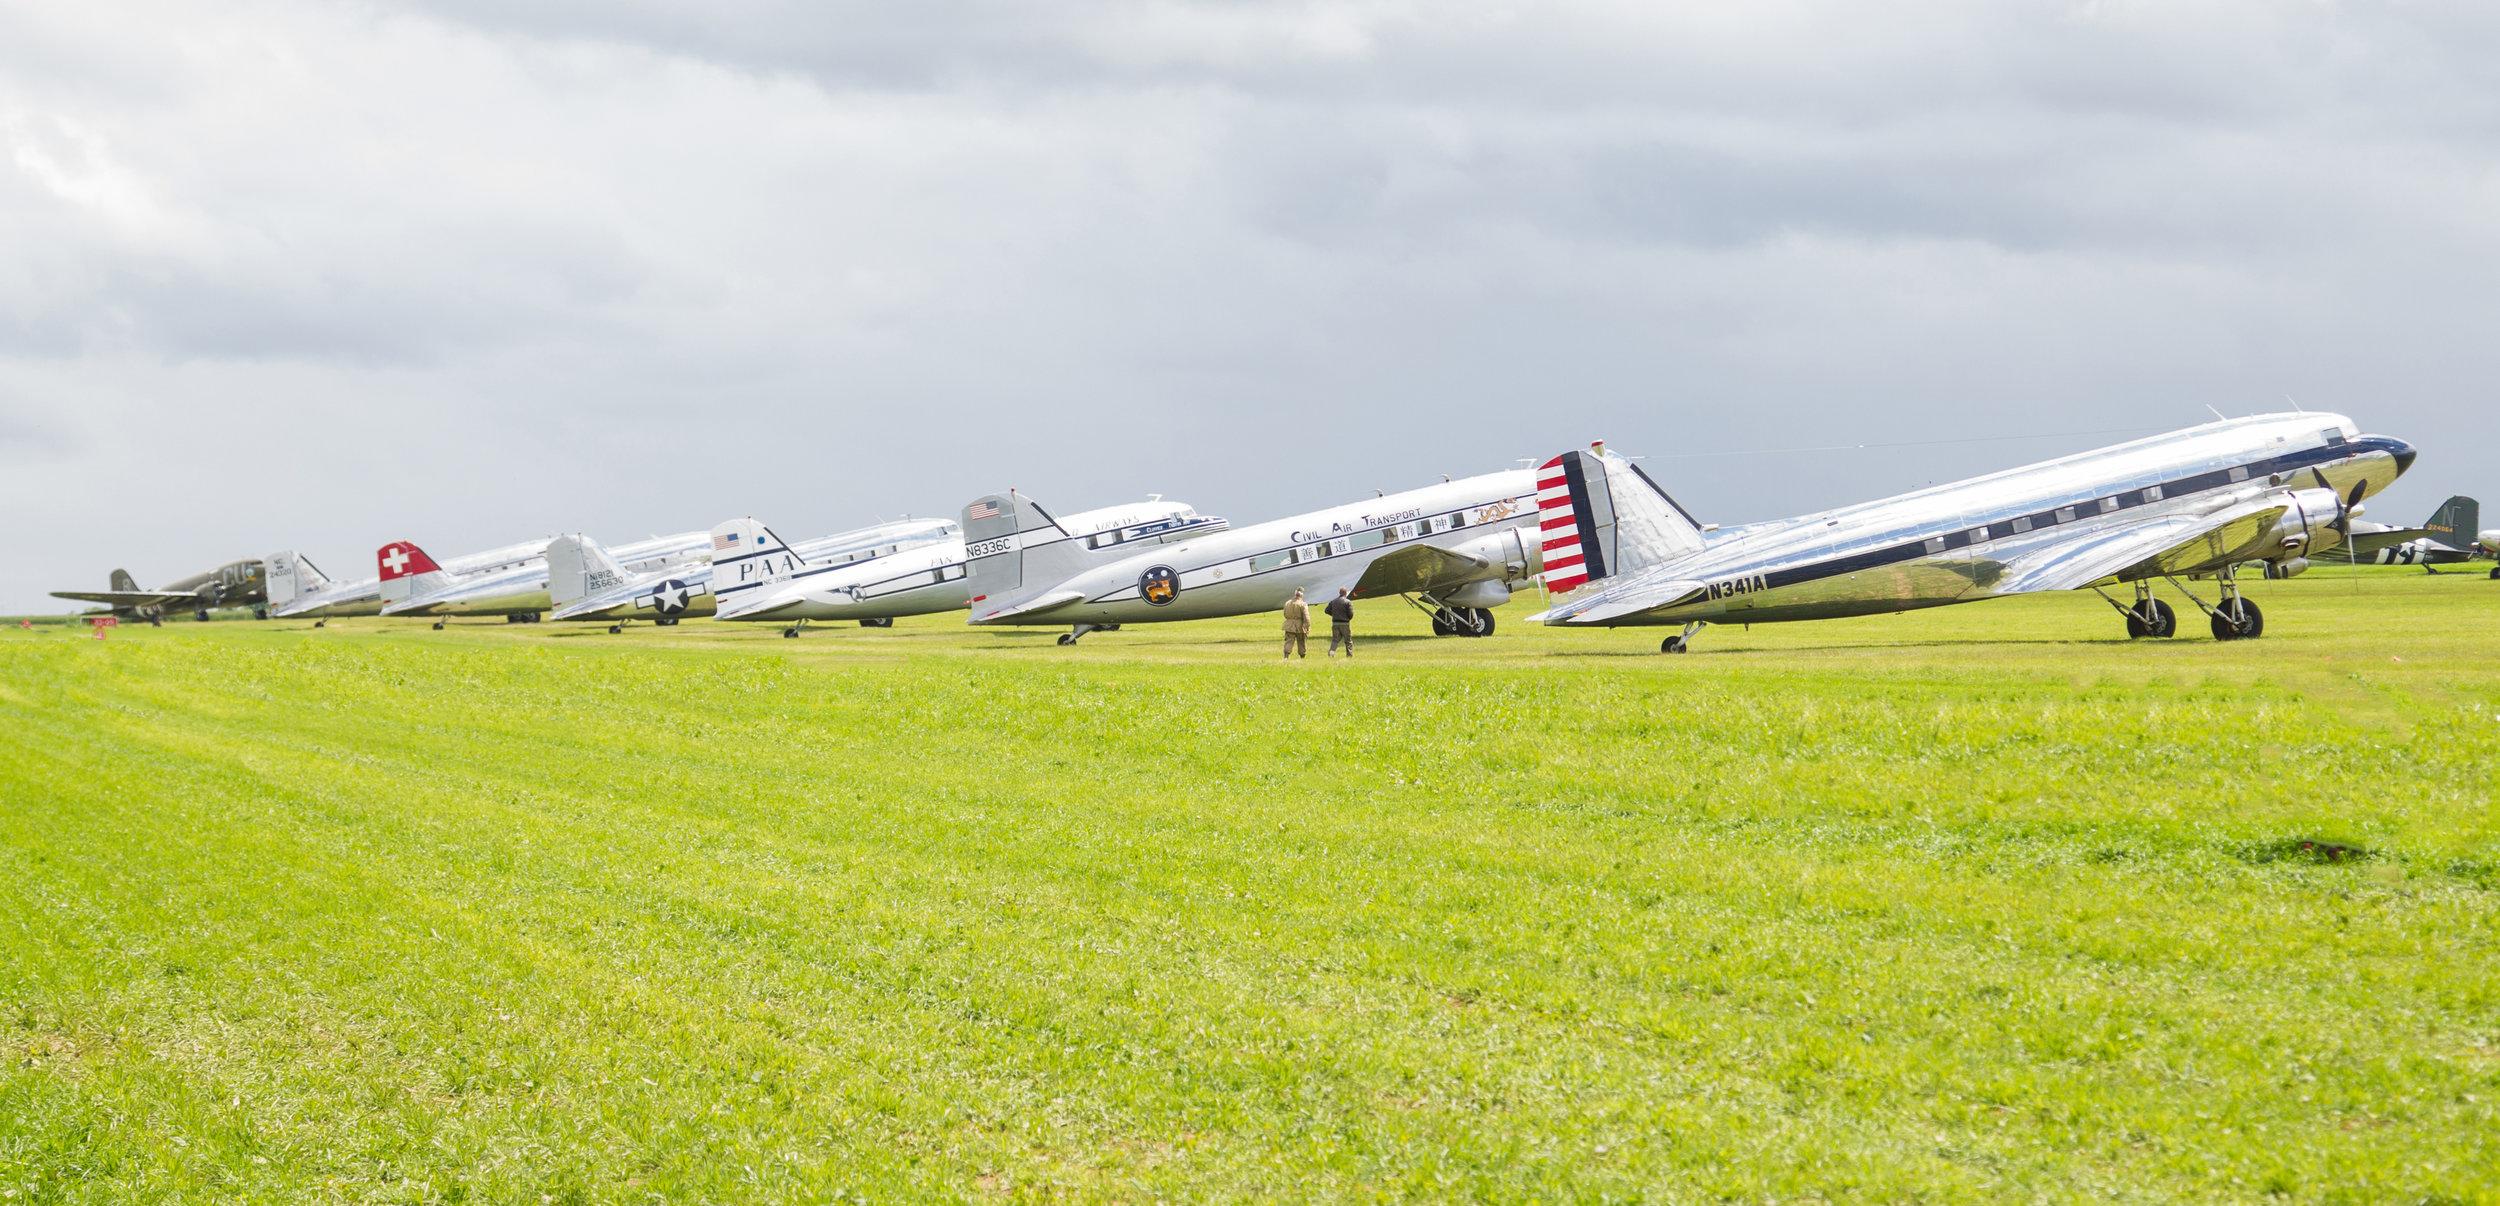 DAK's at Caen airport (Normandy) 7th June 2019. Photo: Debbie Riley.